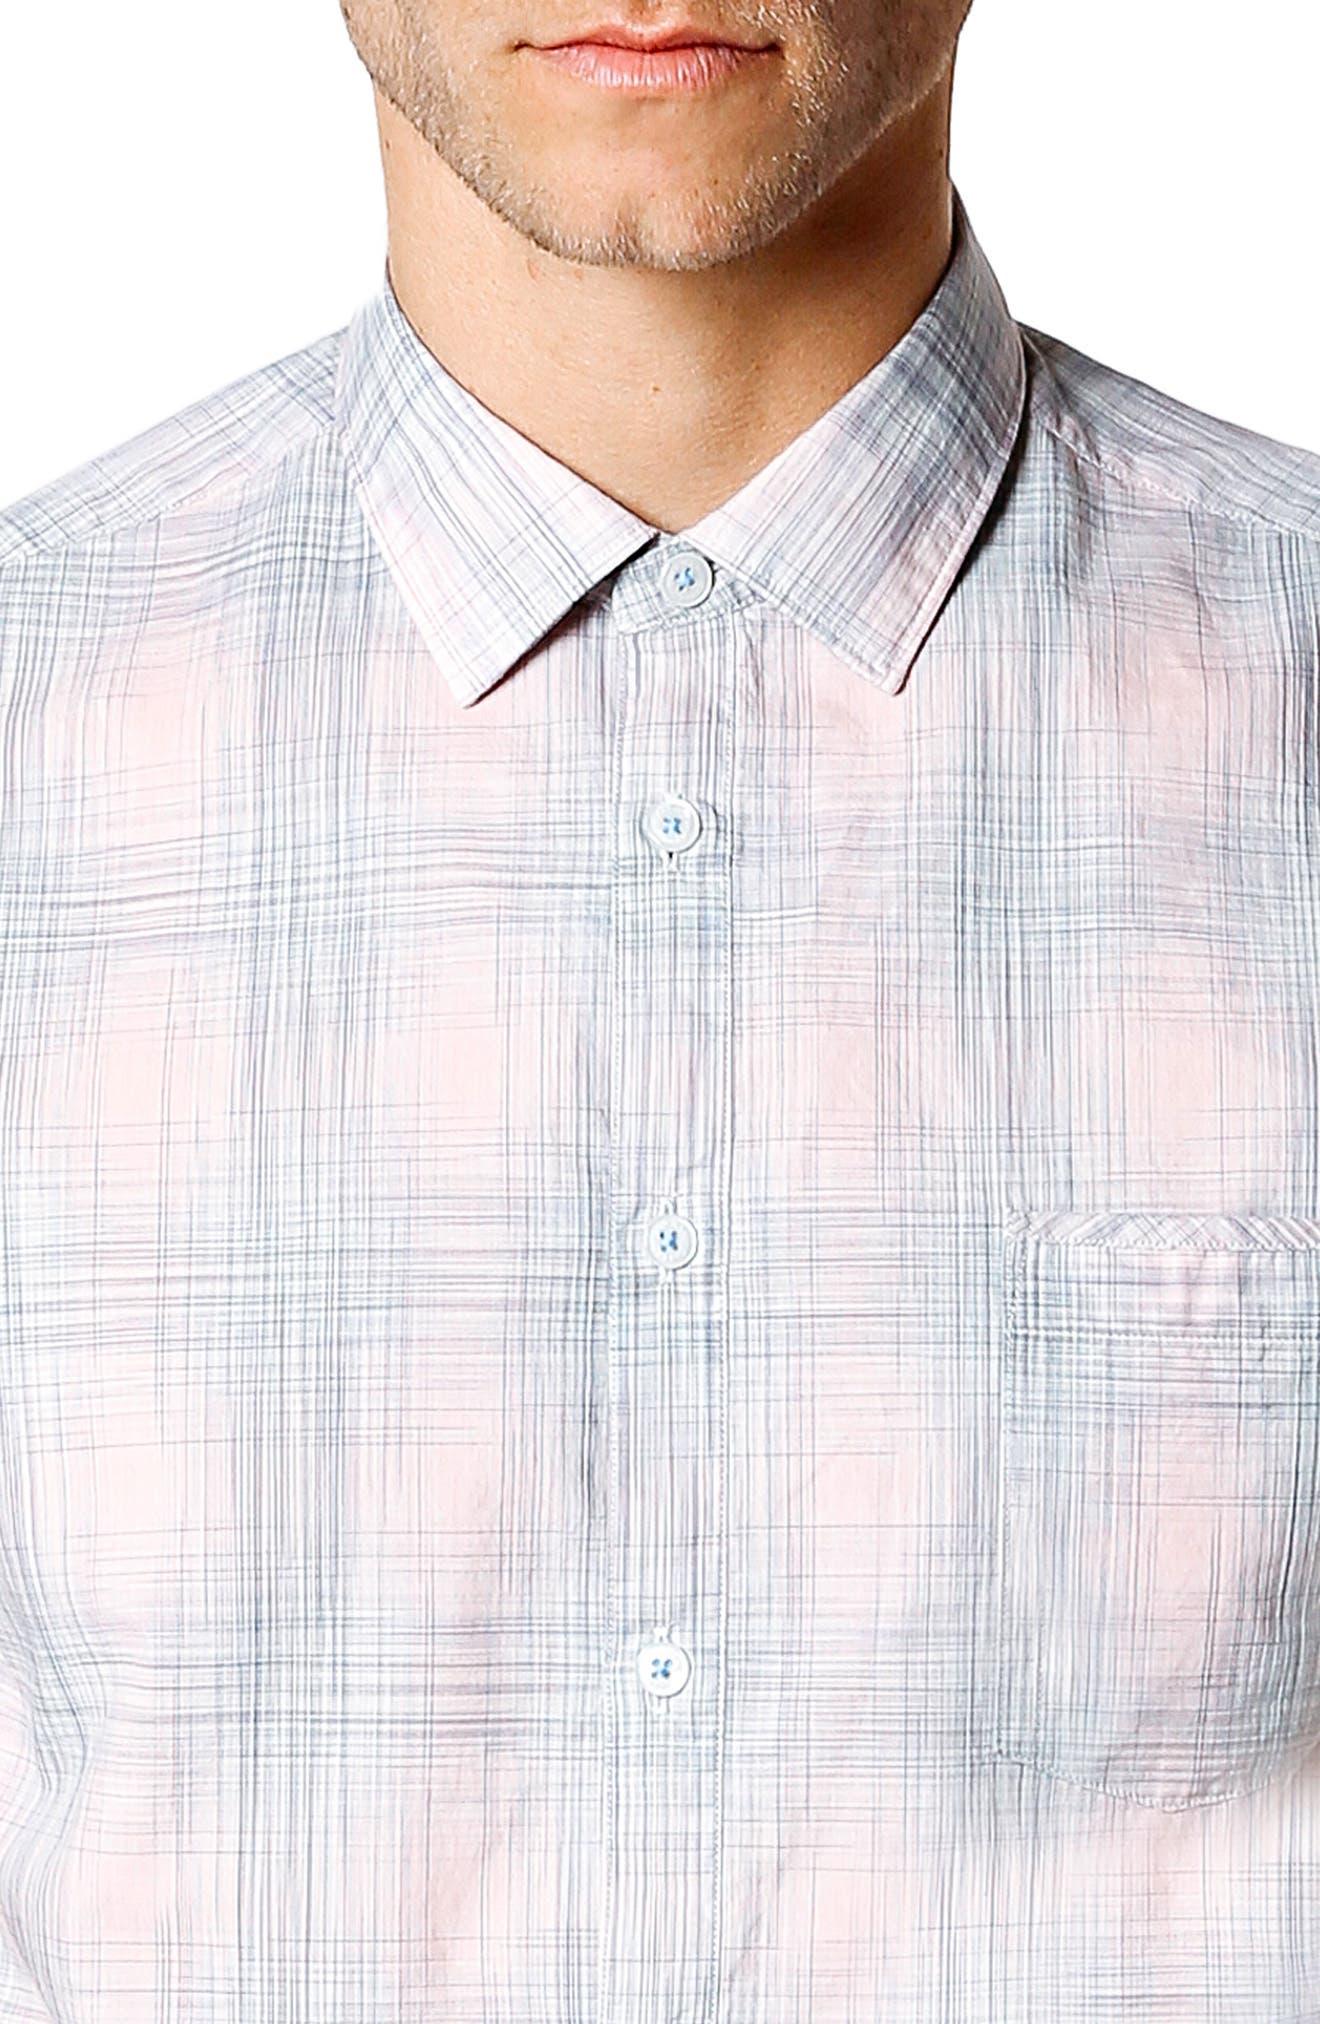 Trim Fit Short Sleeve Sport Shirt,                             Alternate thumbnail 4, color,                             Pink